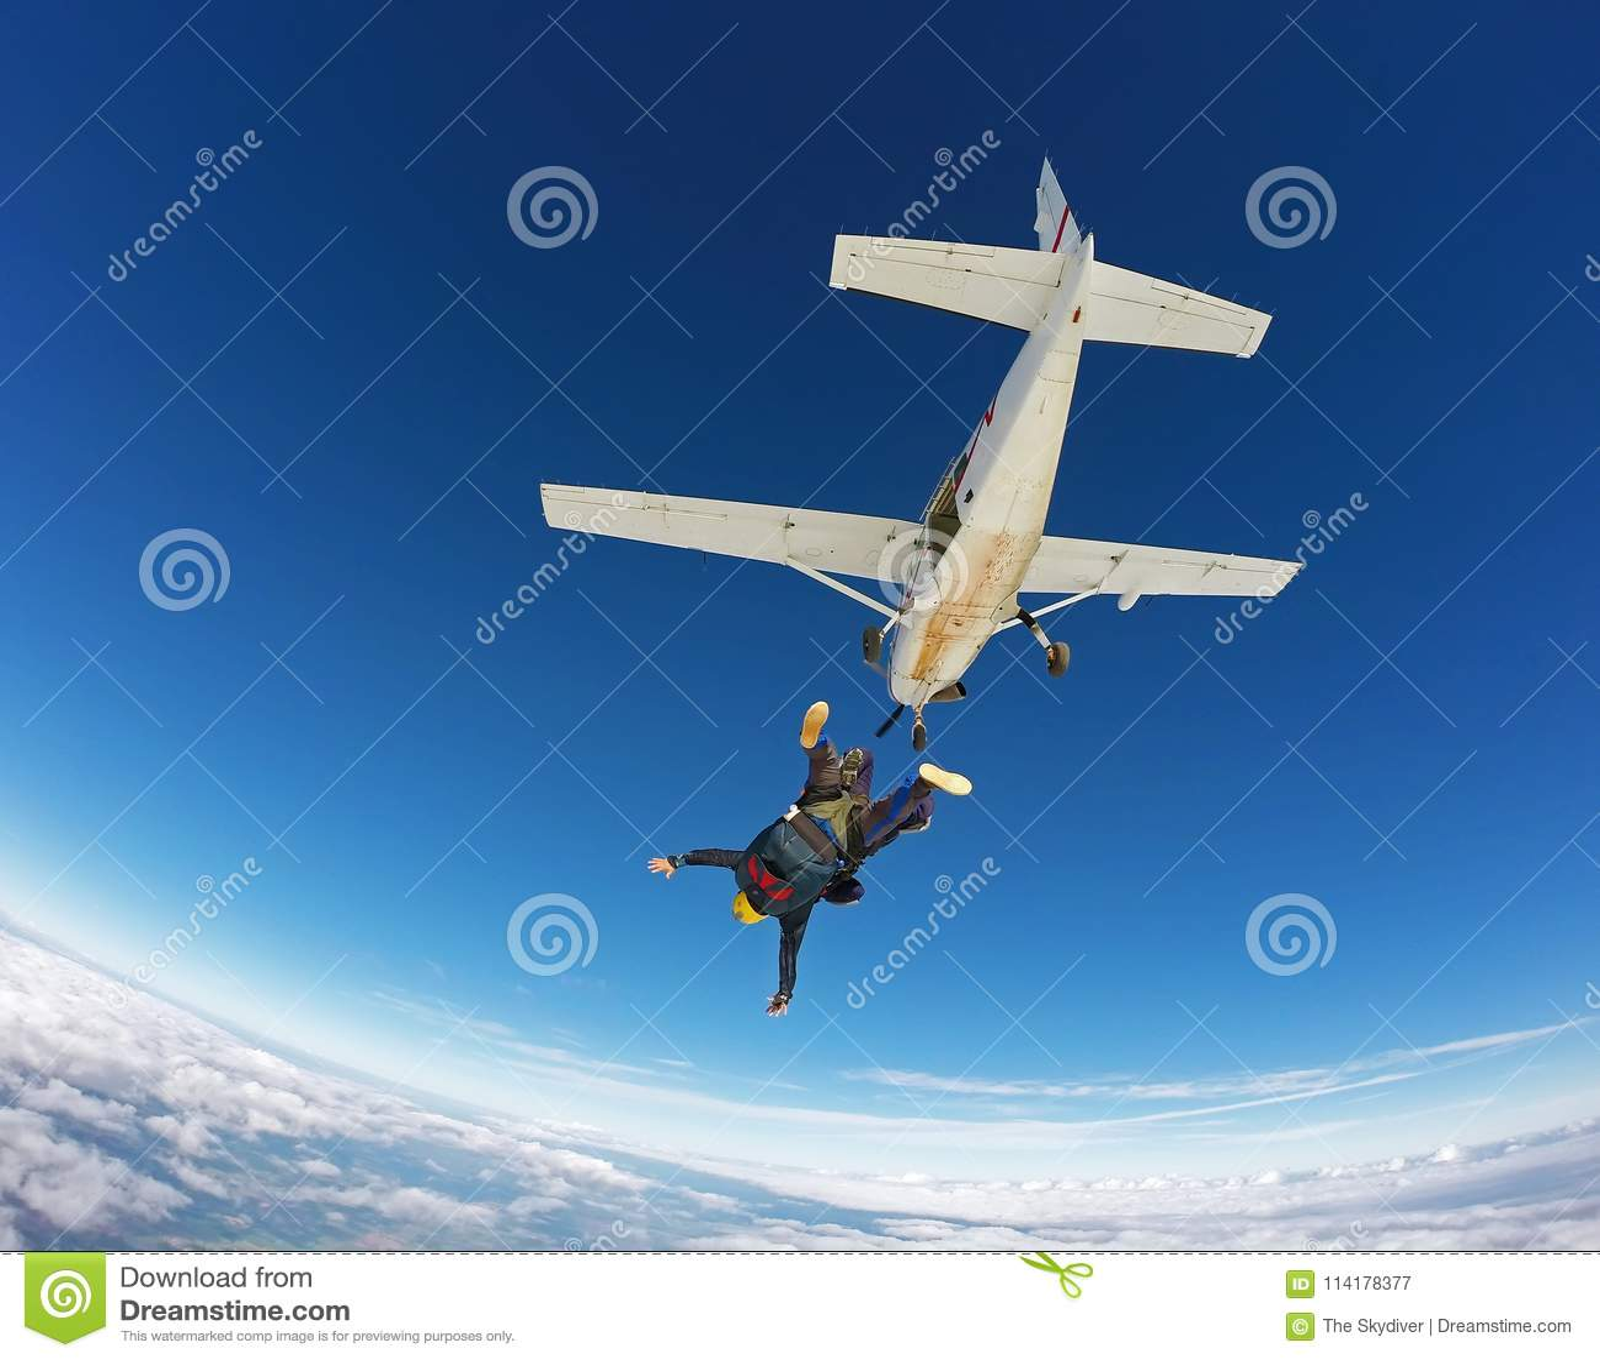 Lanciar in caduta liberasi salto in tandem